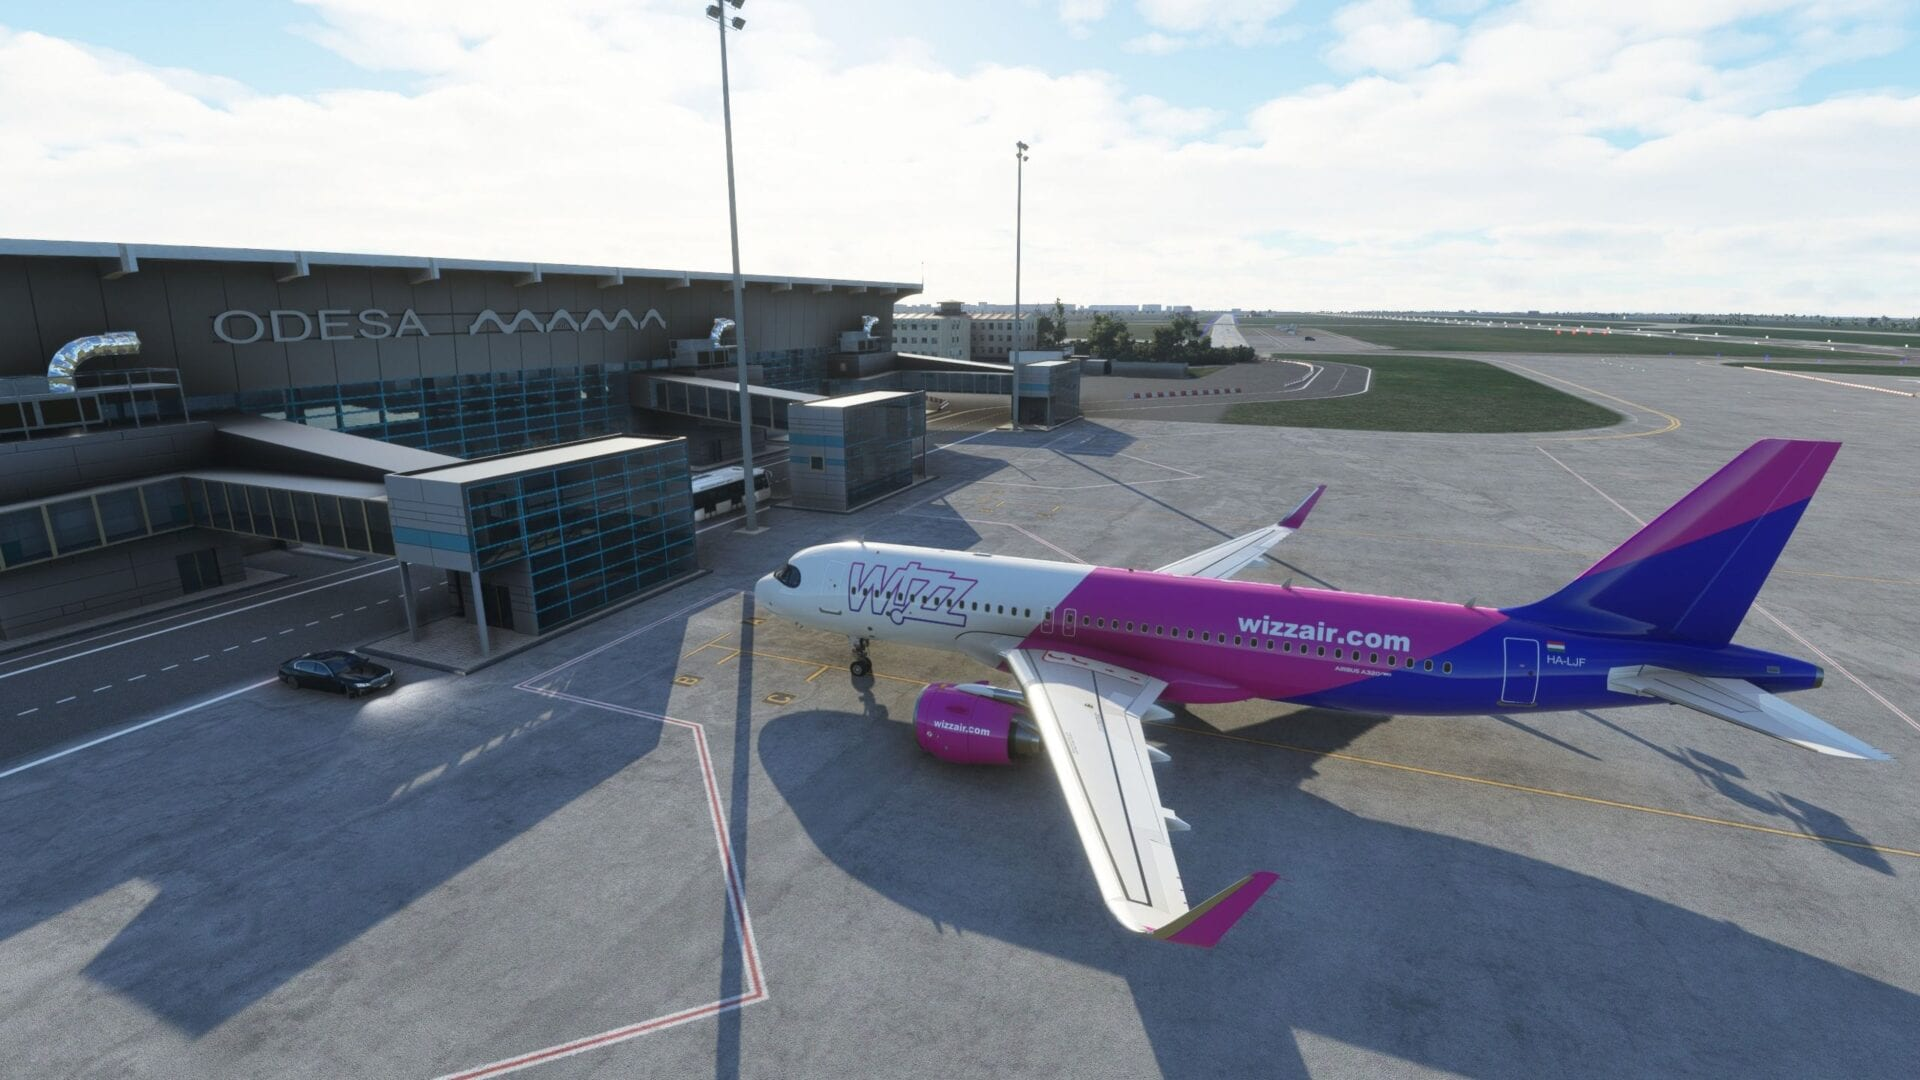 Microsoft Flight Simulator Odesa